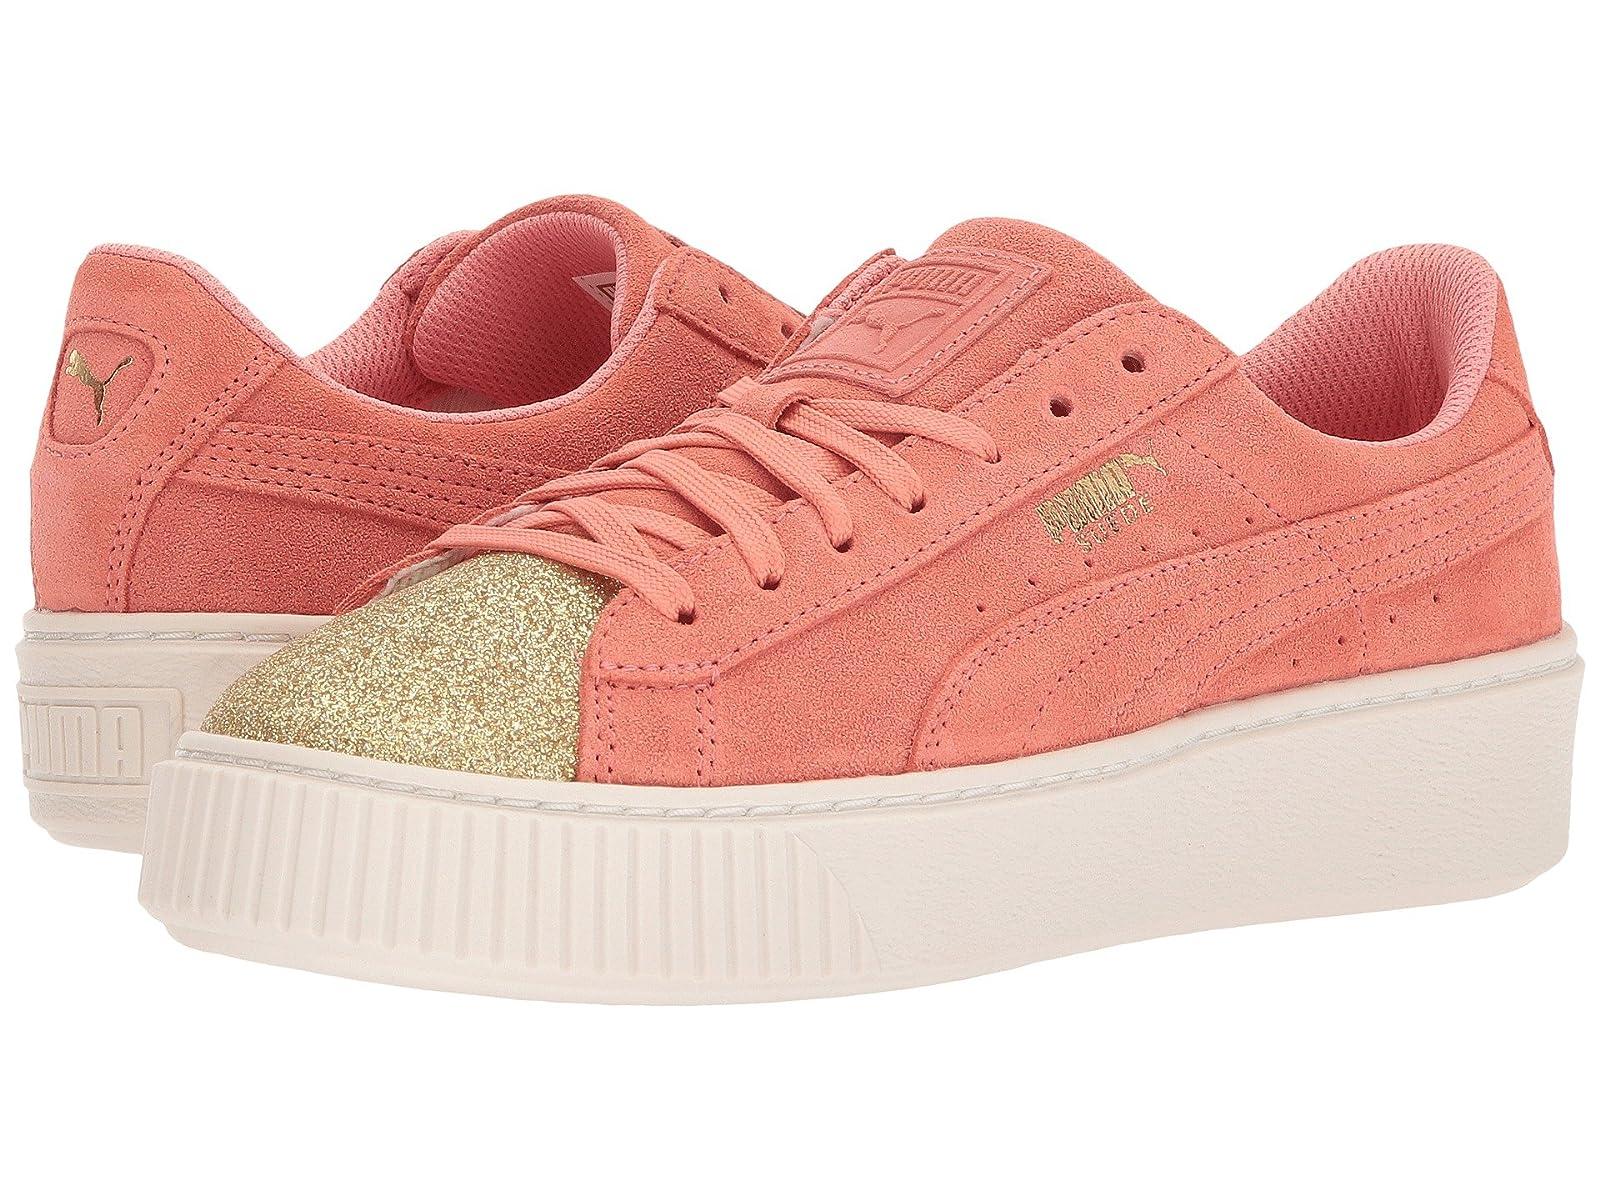 Puma Kids Suede Platform Glam (Big Kid)Cheap and distinctive eye-catching shoes